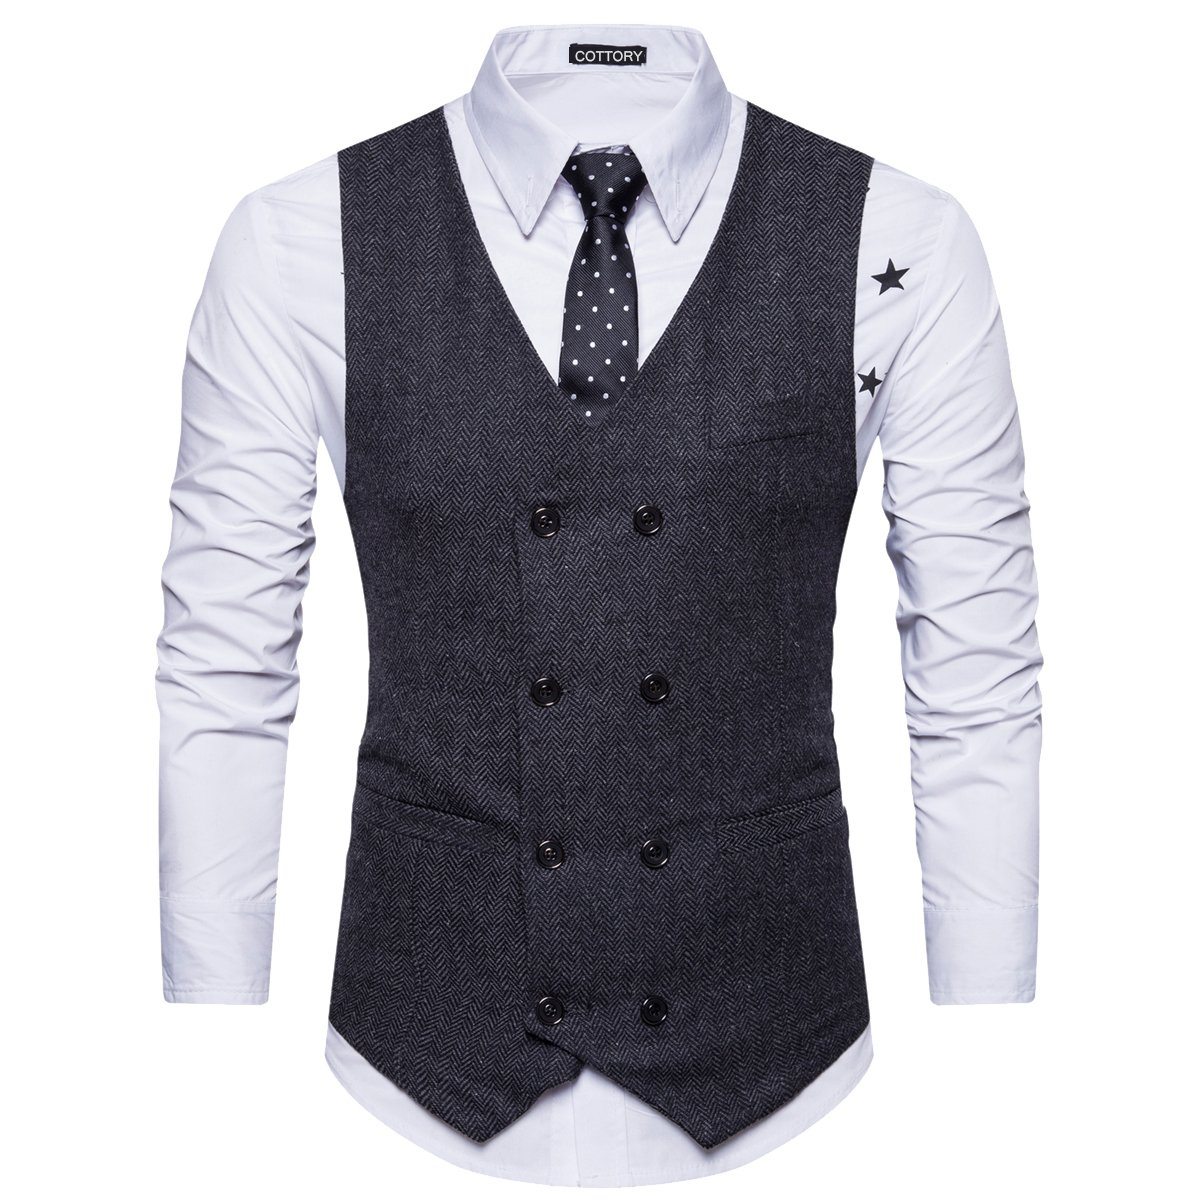 Cottory Men's Vintage Slim Fit Double-breasted Solid Suit Vest Black Large